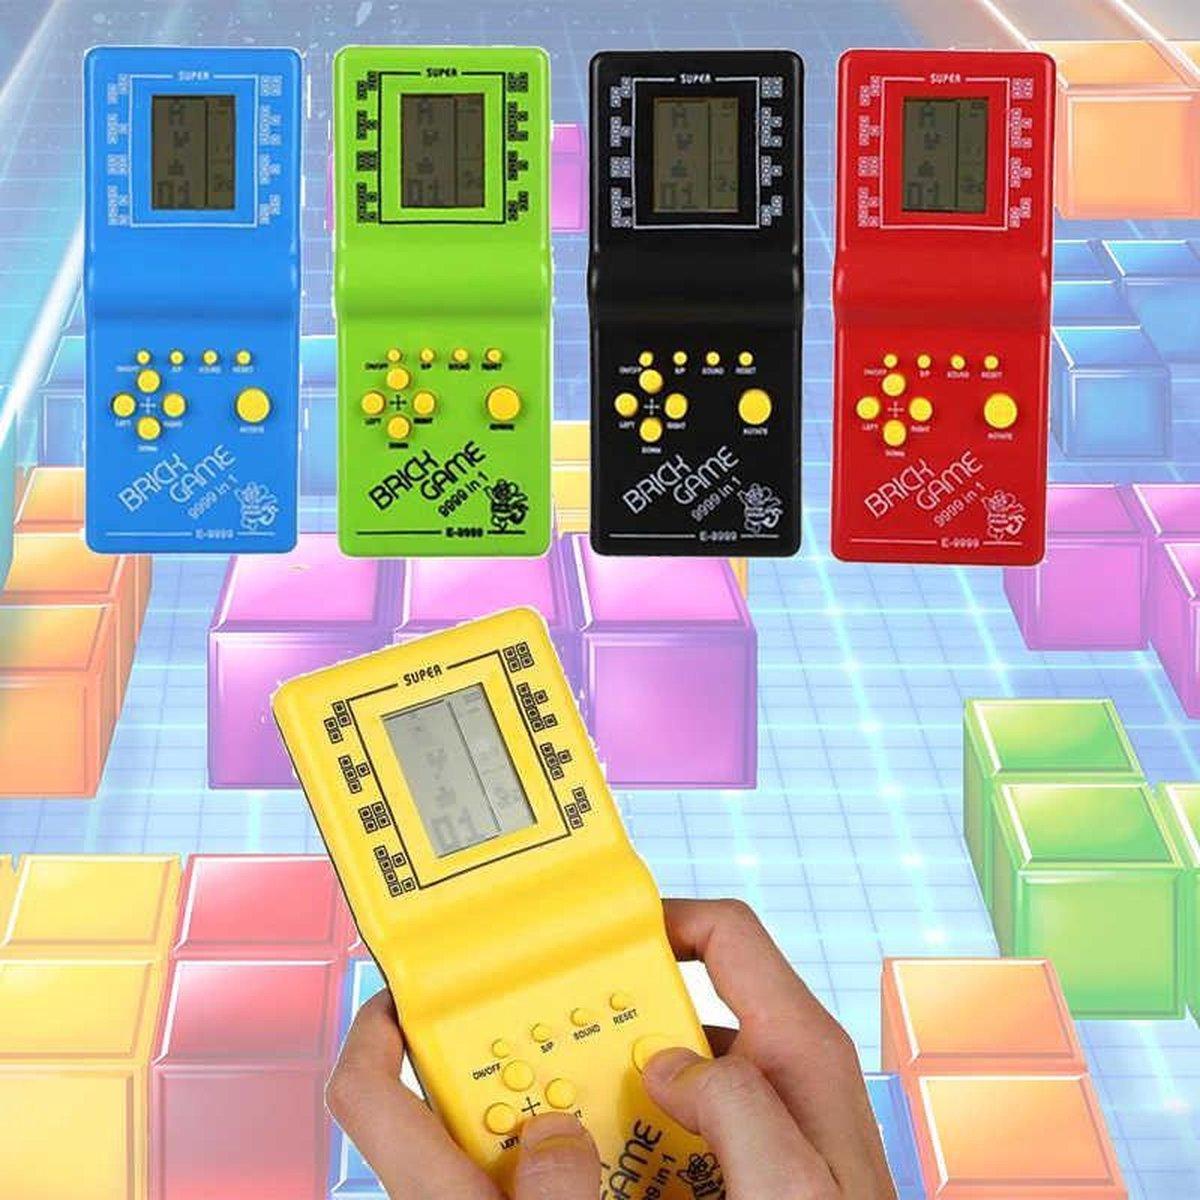 BBEC Toys Klassieke Tetris Spel Brick Game Handheld LCD Electronic Game Retro